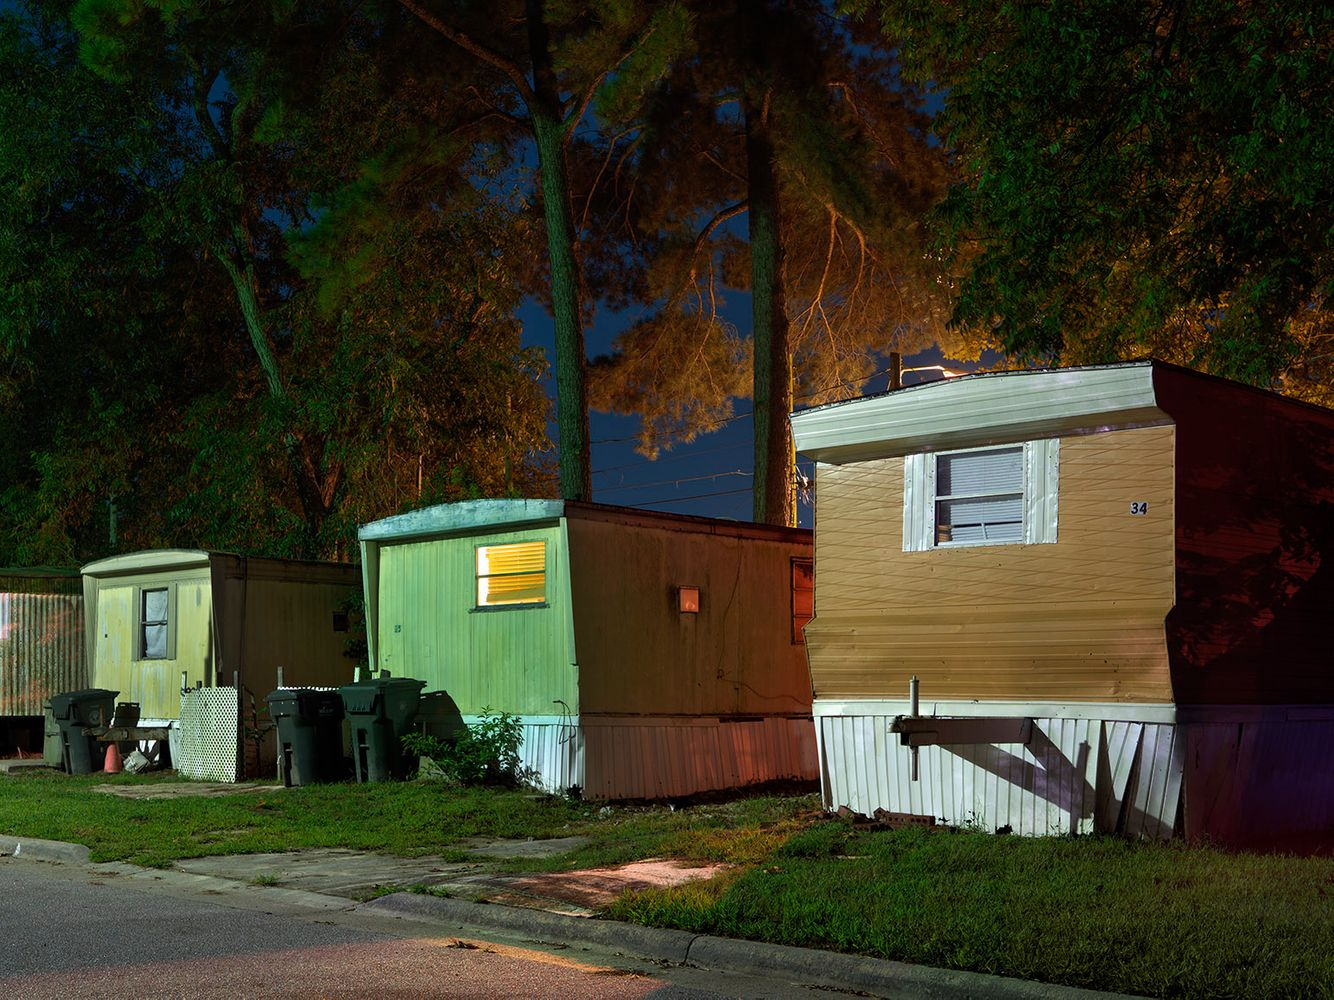 Trailer Park, Wilson, NC 2018